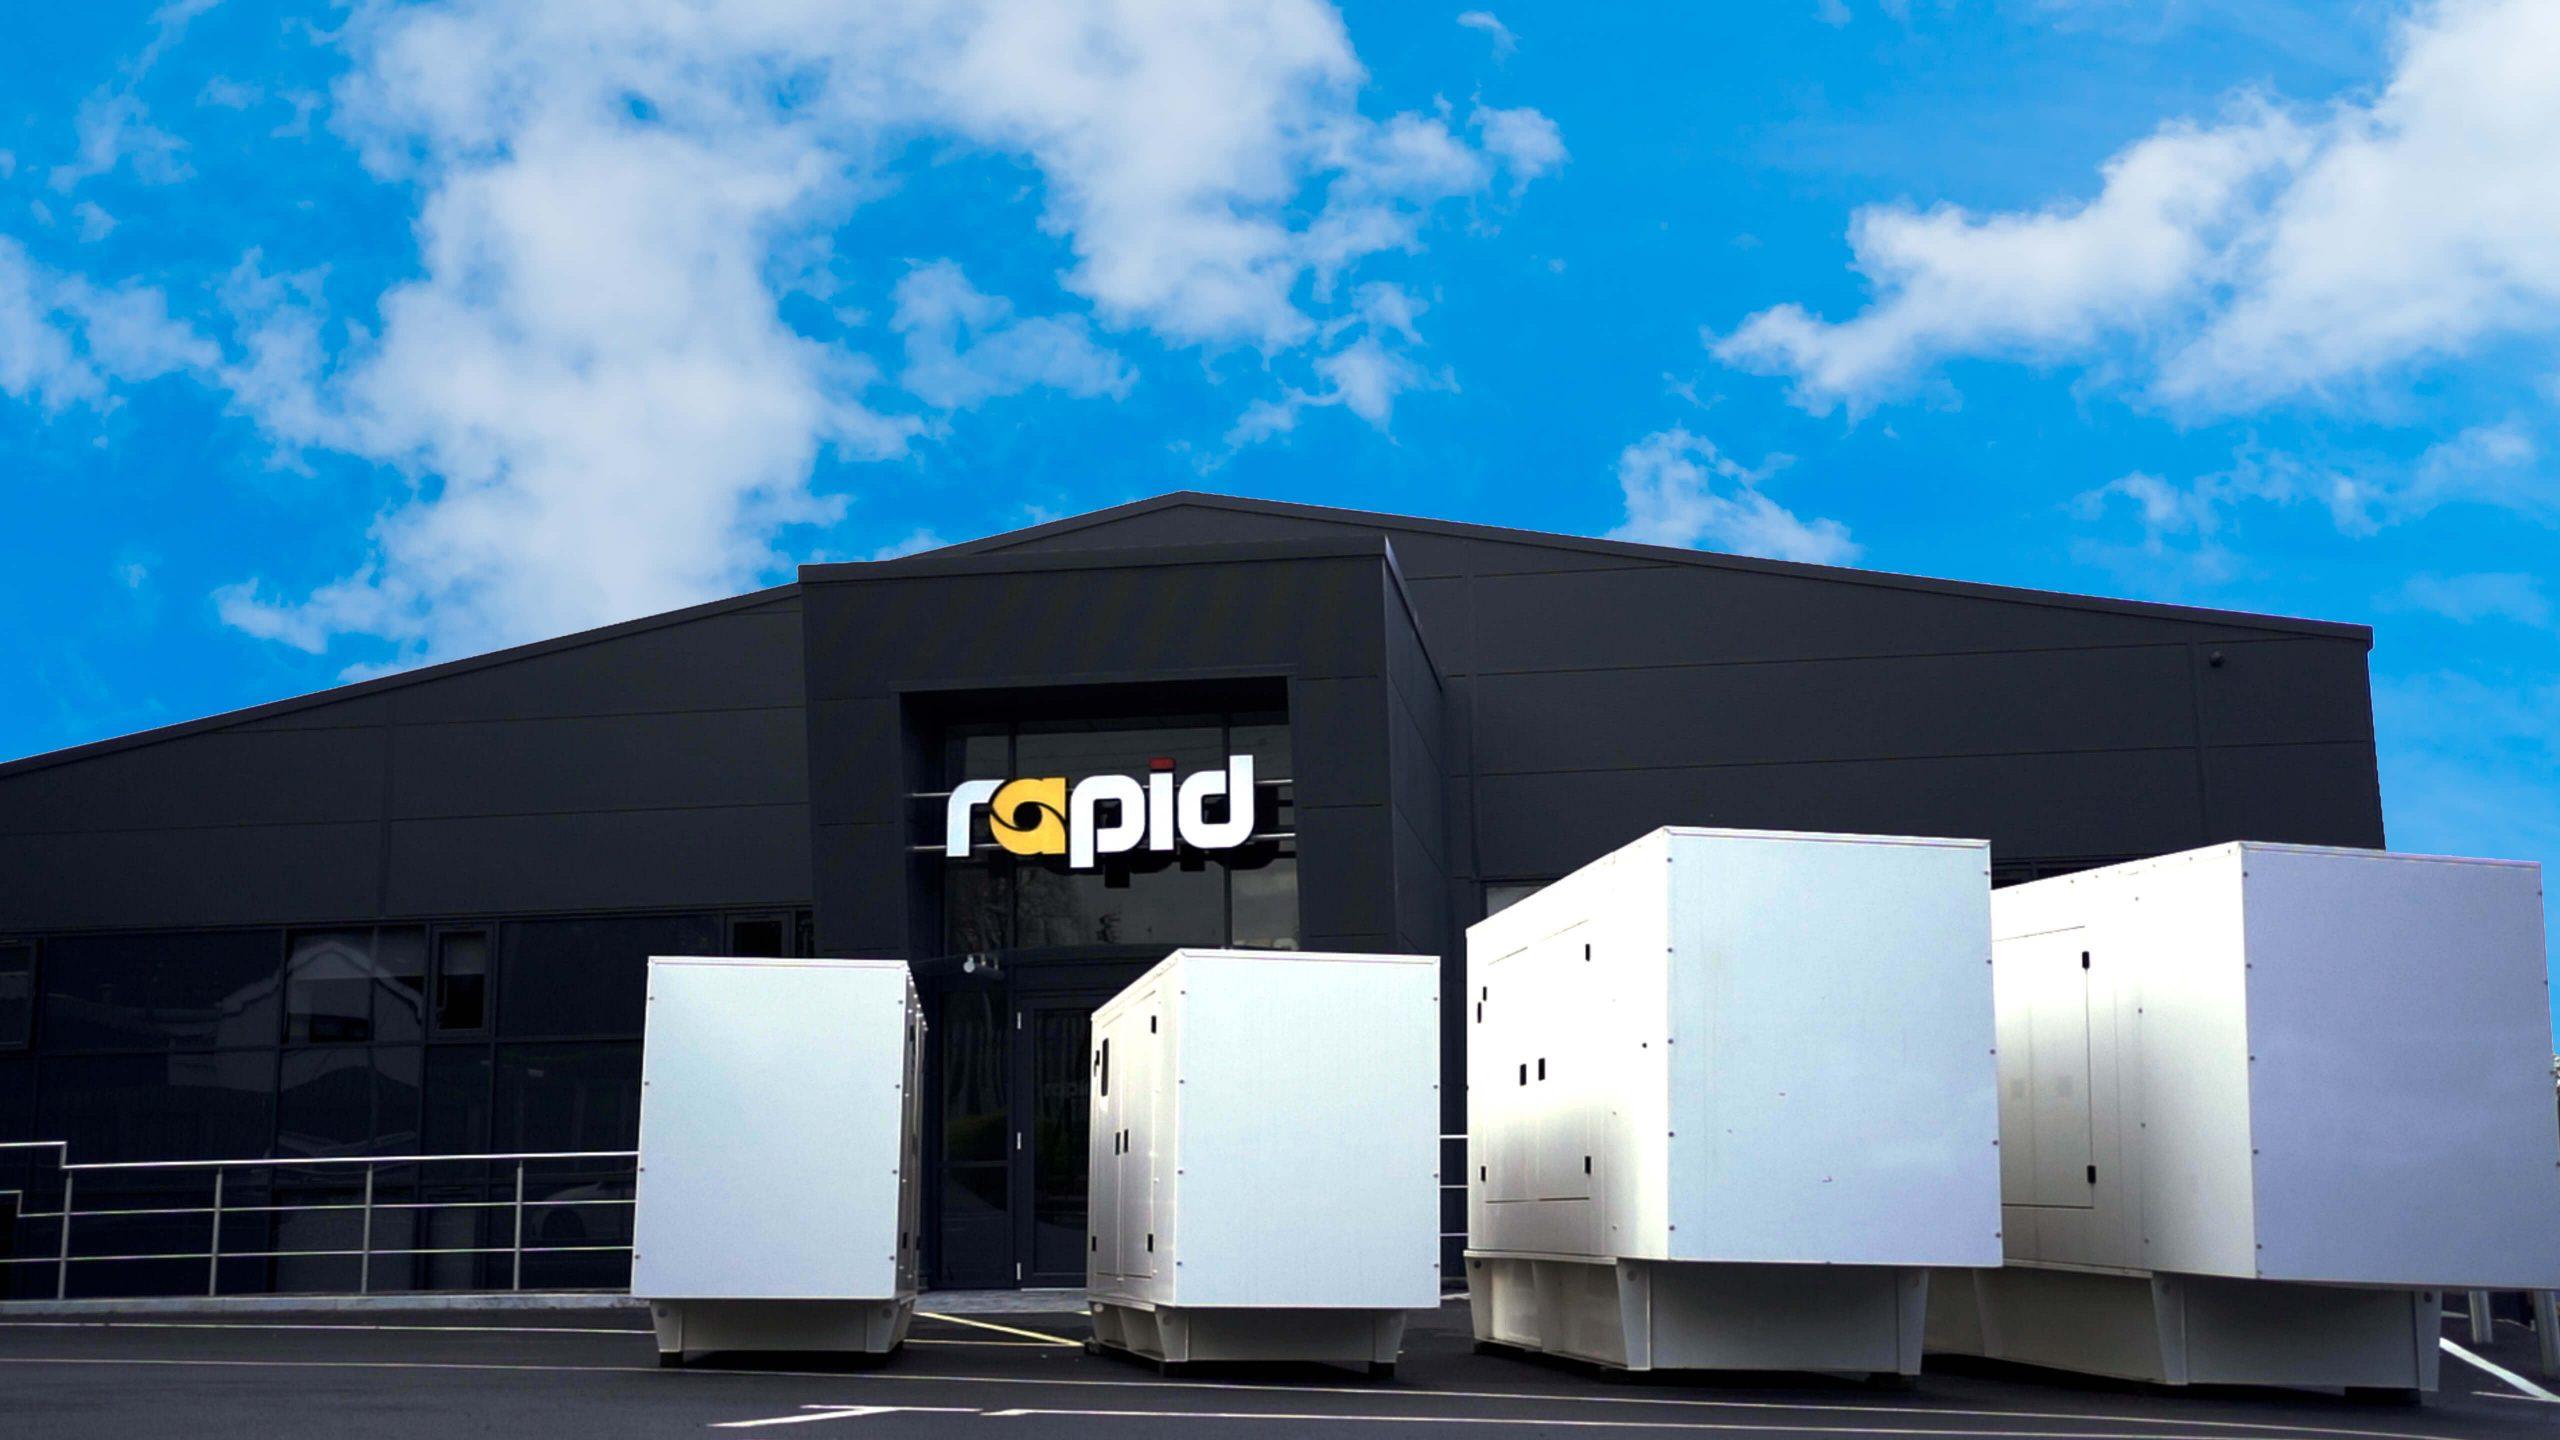 New Rapid International Rapid Power Generation Factory Extension